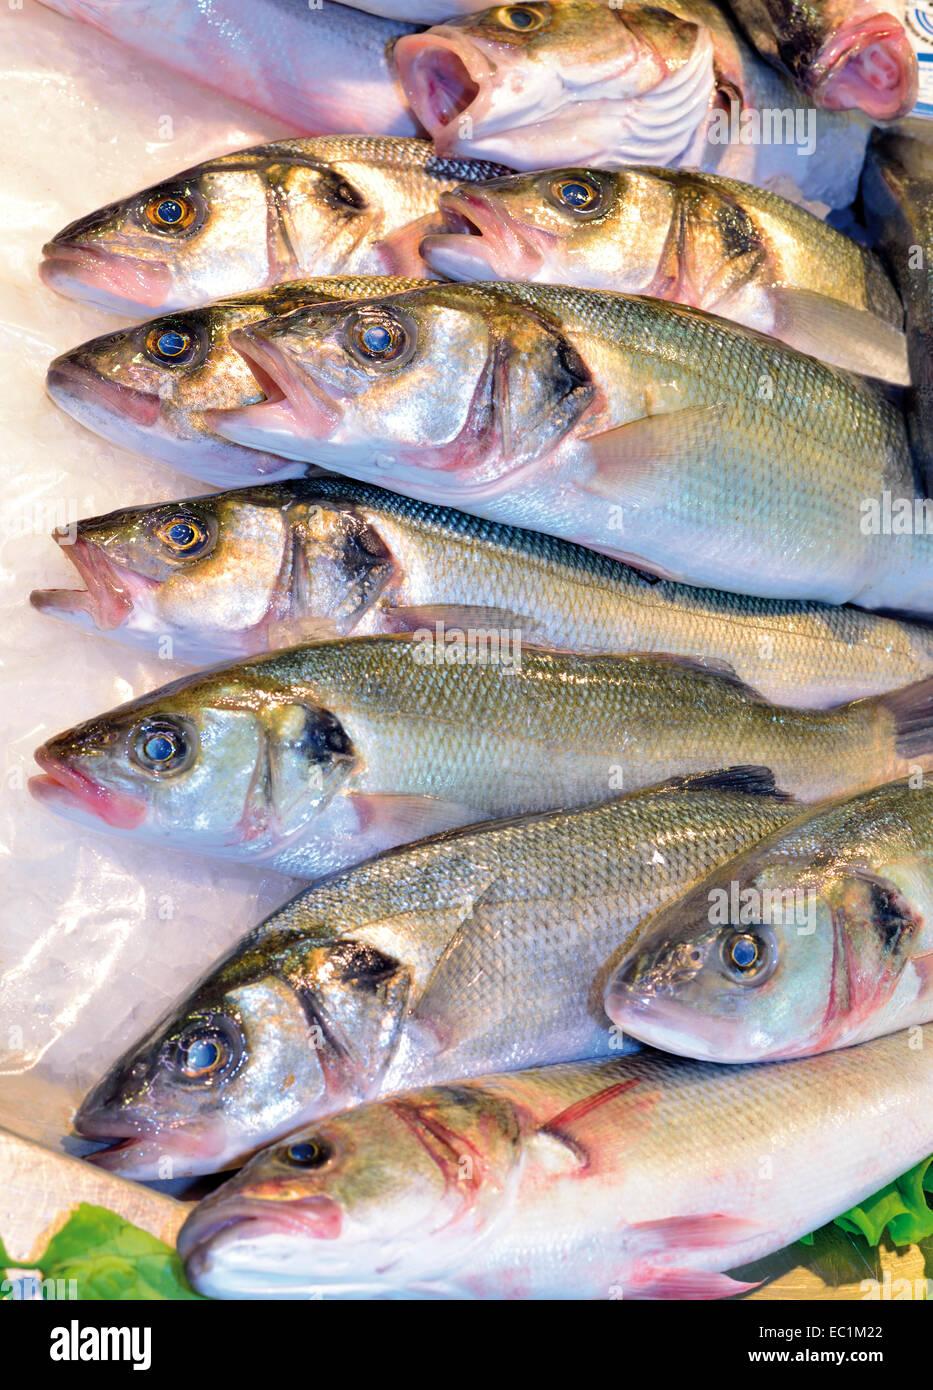 Portugal, Algarve: Fresh fish in the Mercado Municipal in Faro - Stock Image